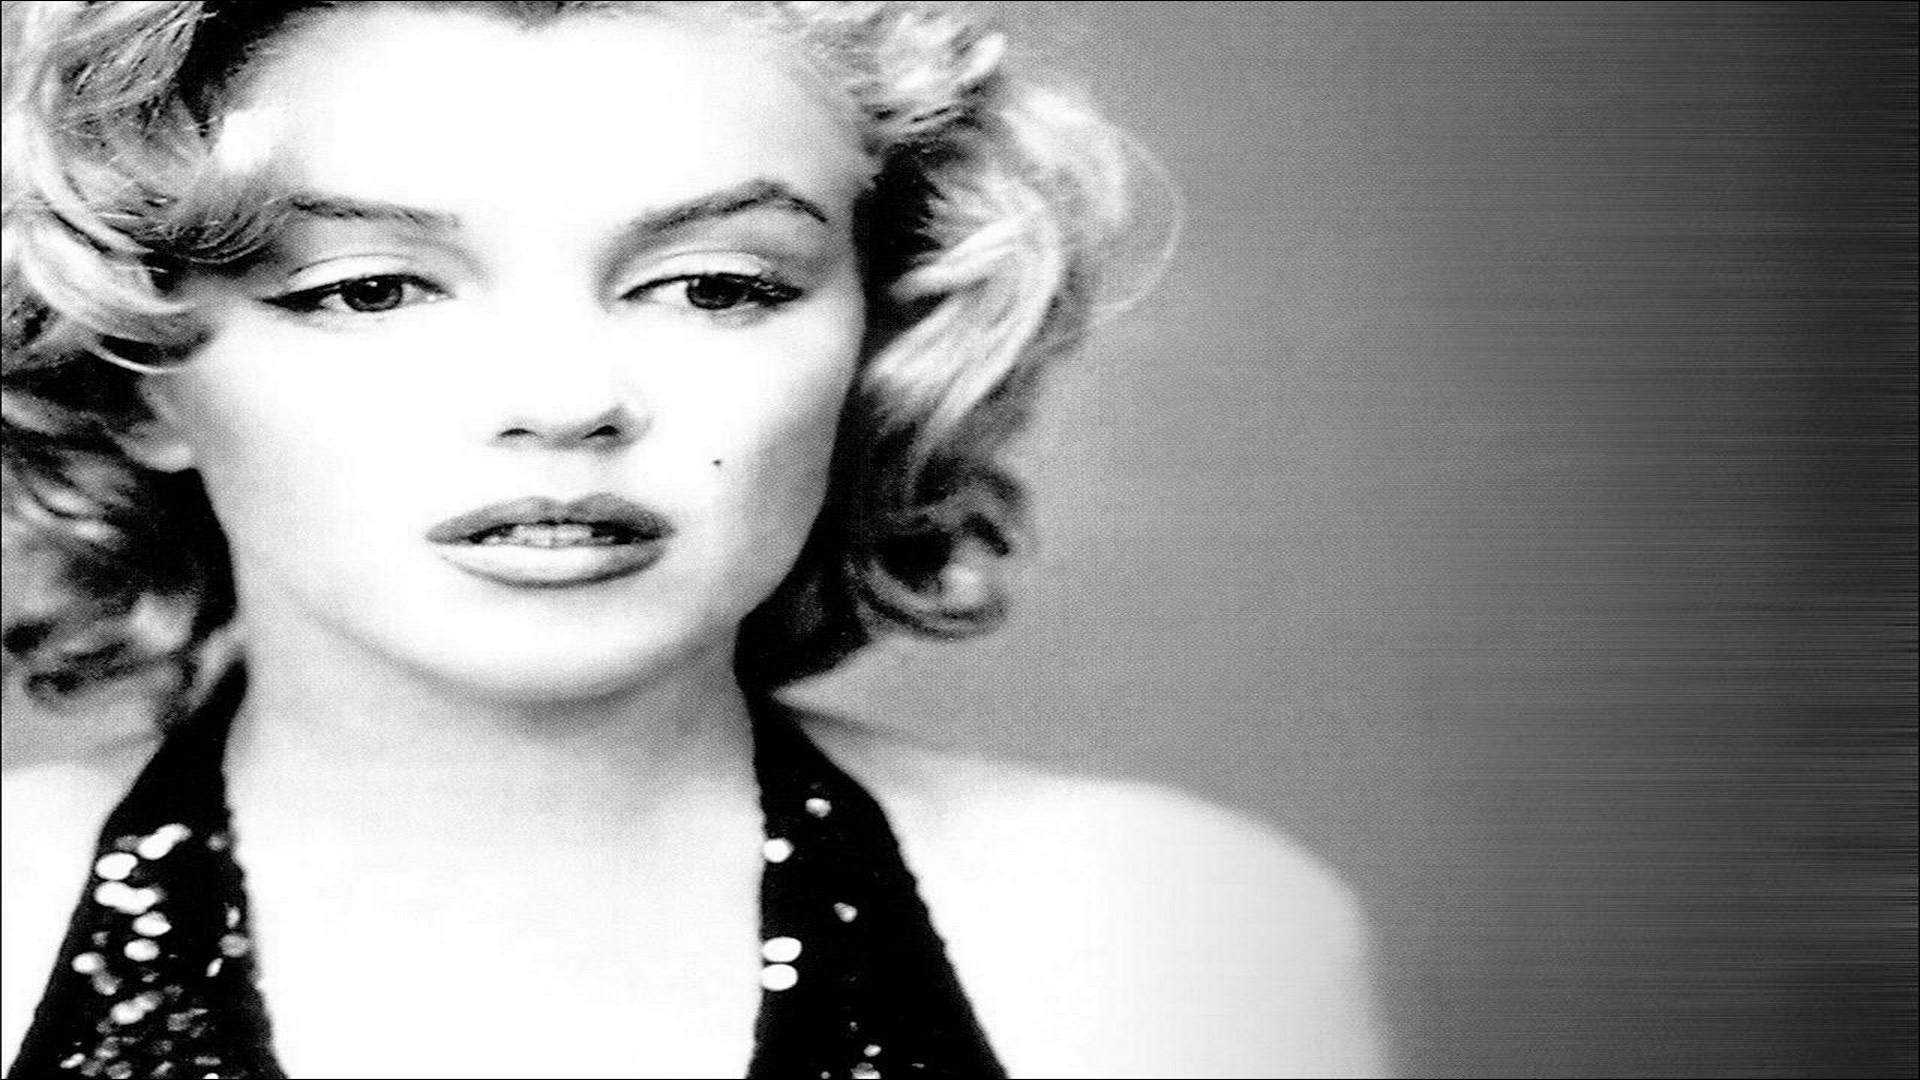 Mac miller wallpaper 72 images - Marilyn monroe wallpaper download ...